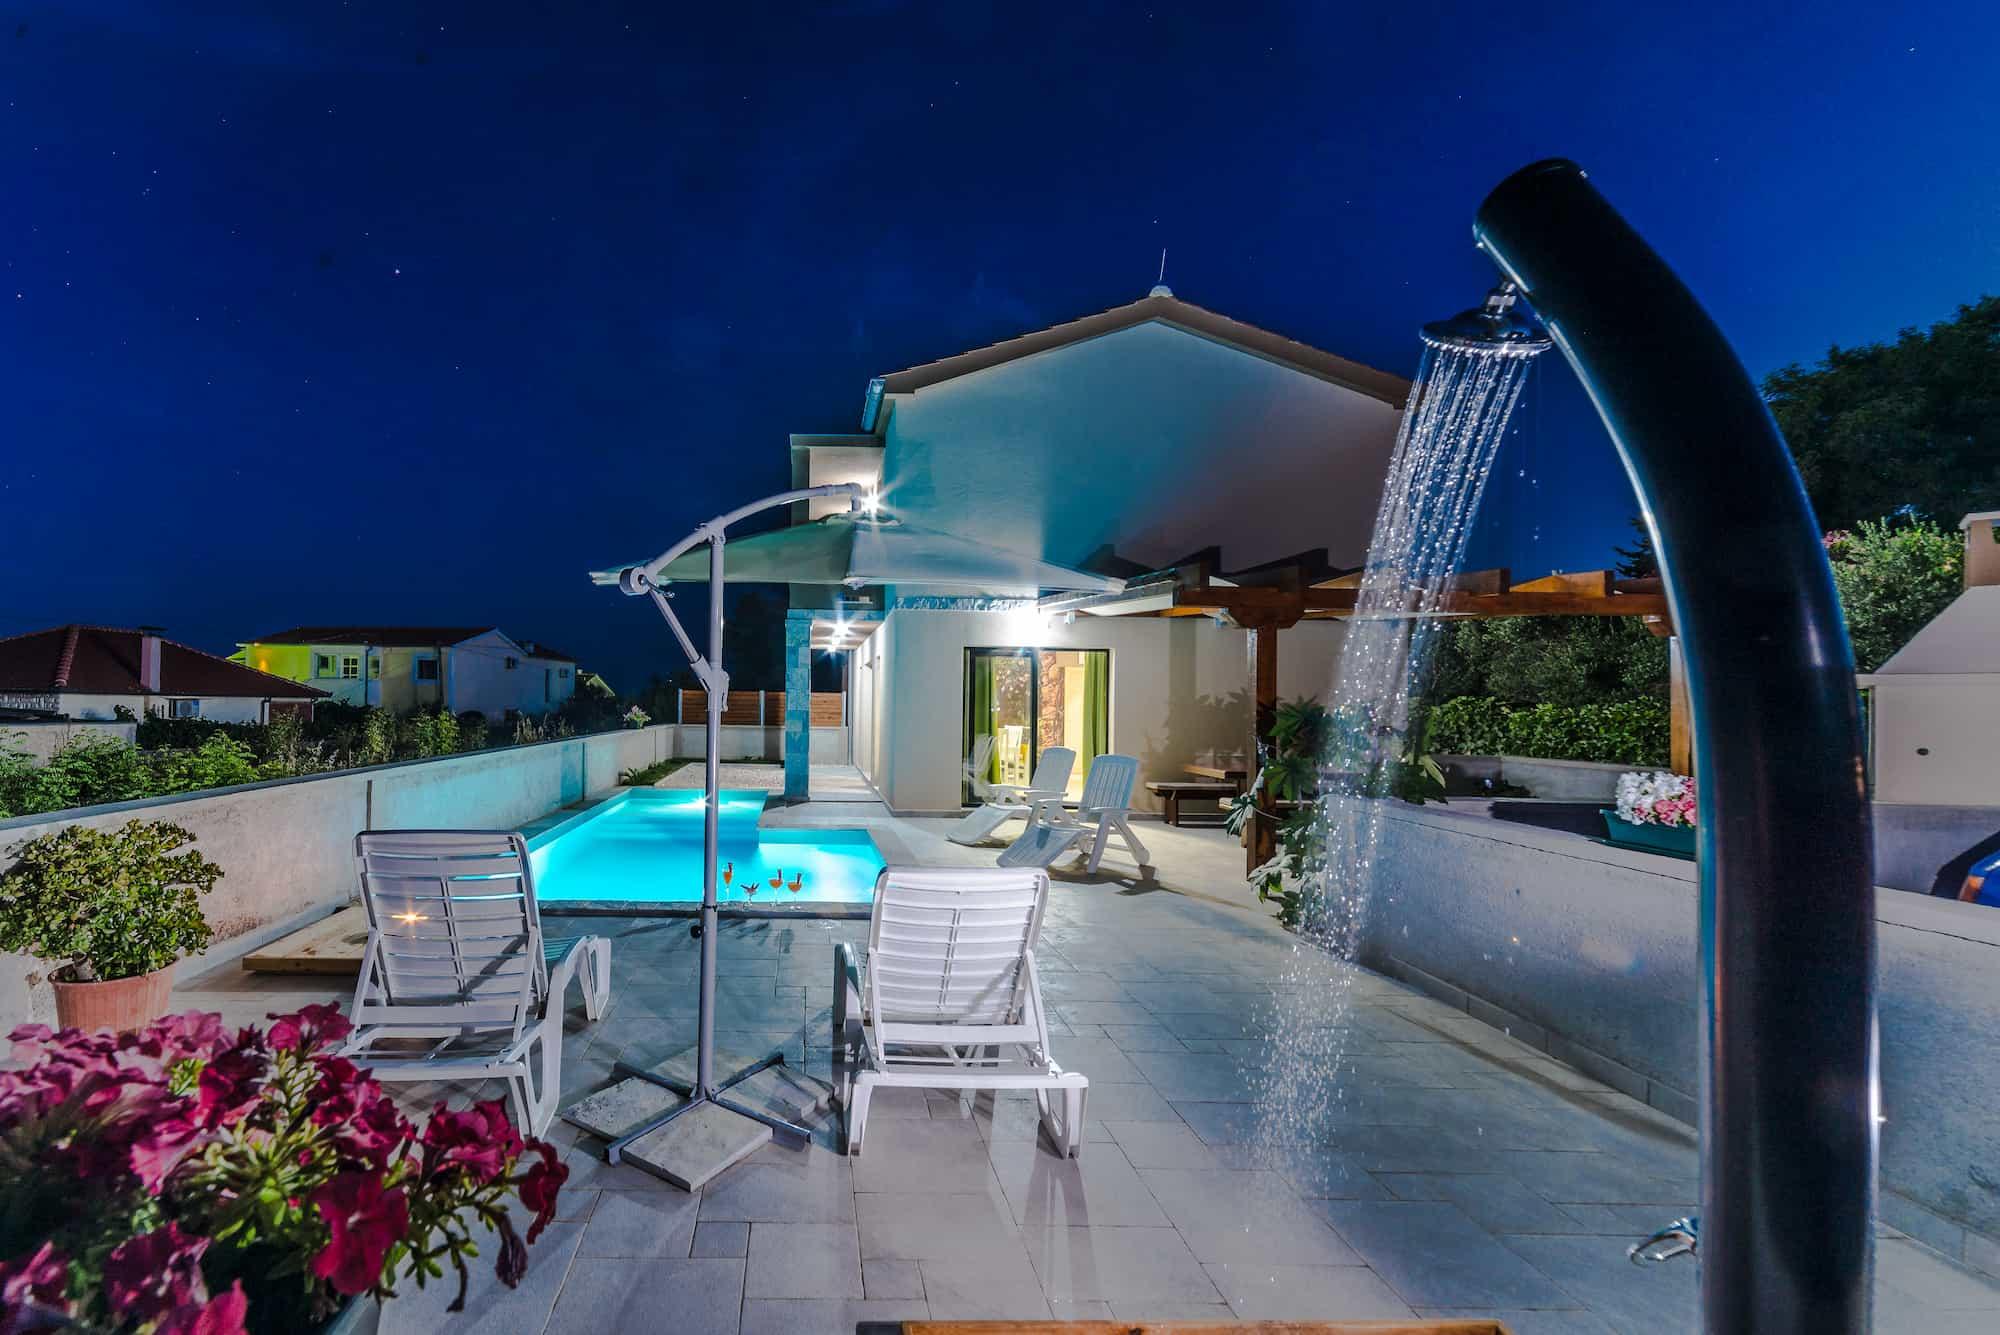 Moderna vila s bazenom, blizina pješčane plaže, pogled na more